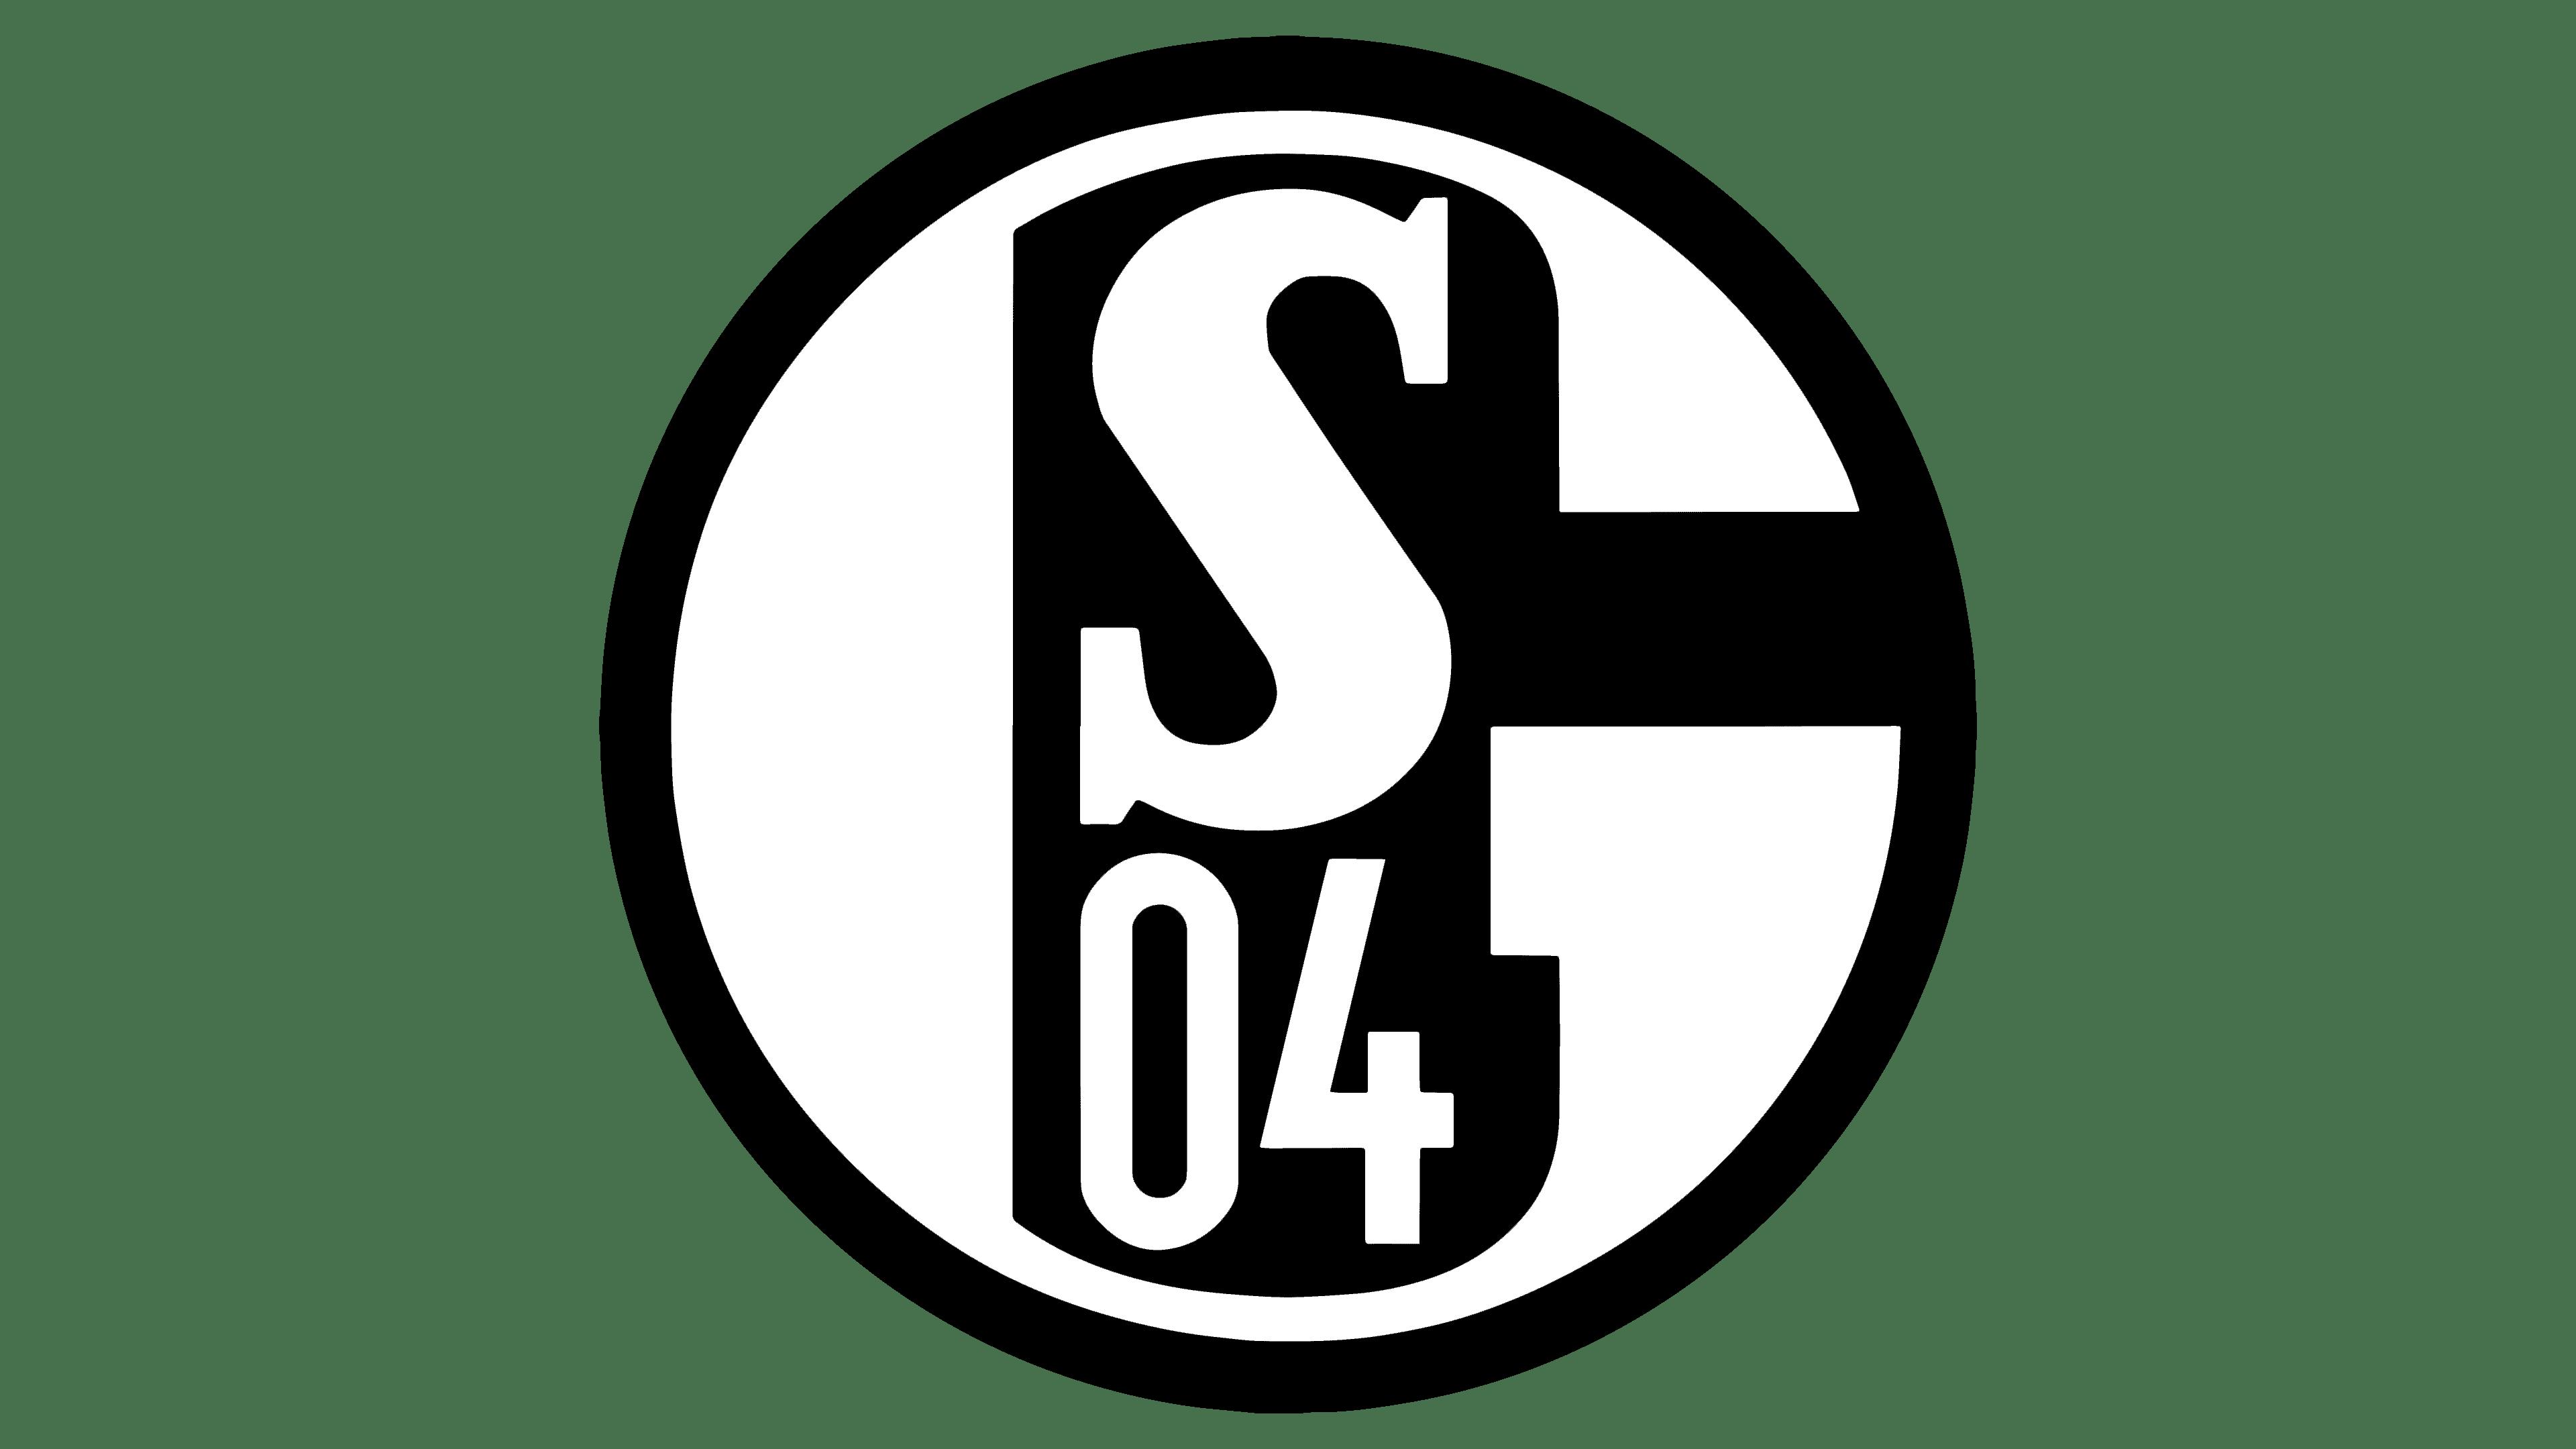 FC Schalke 04 Emblem